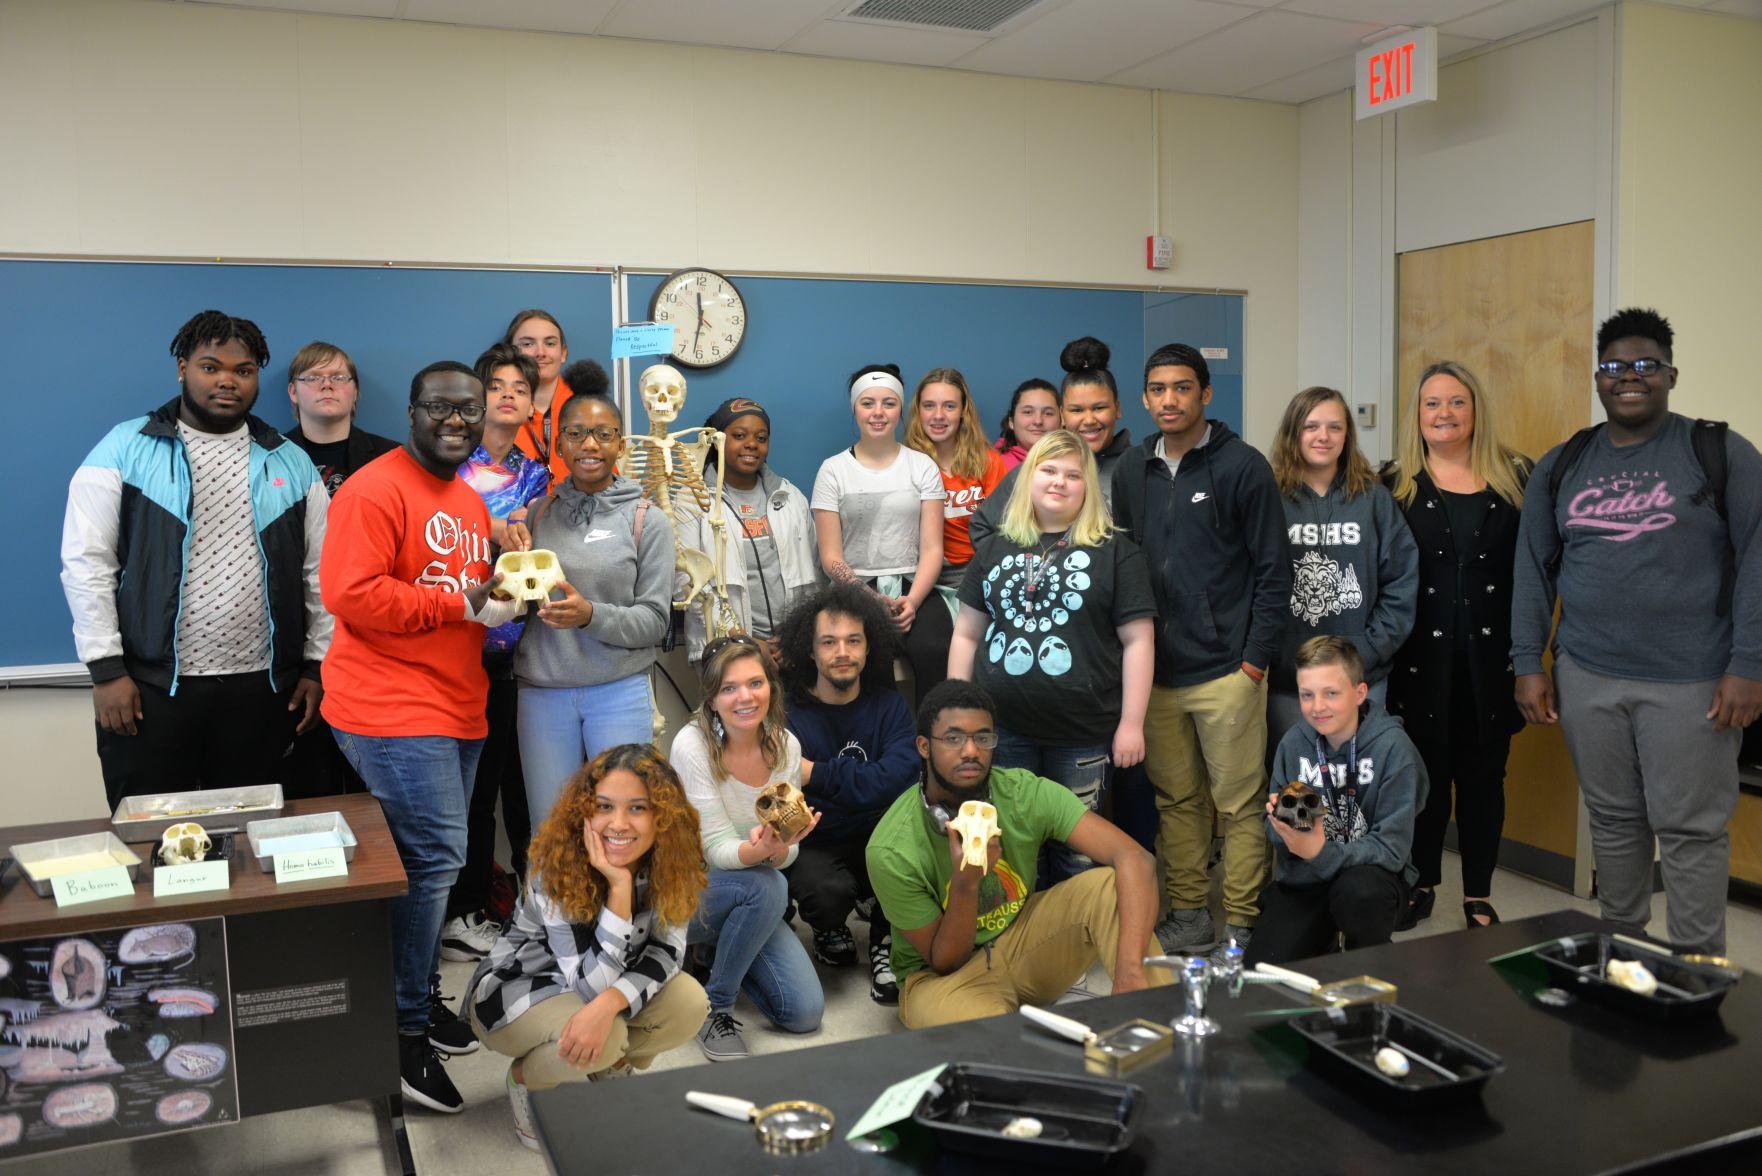 OSU Mansfield launches new mentoring program for high school freshmen